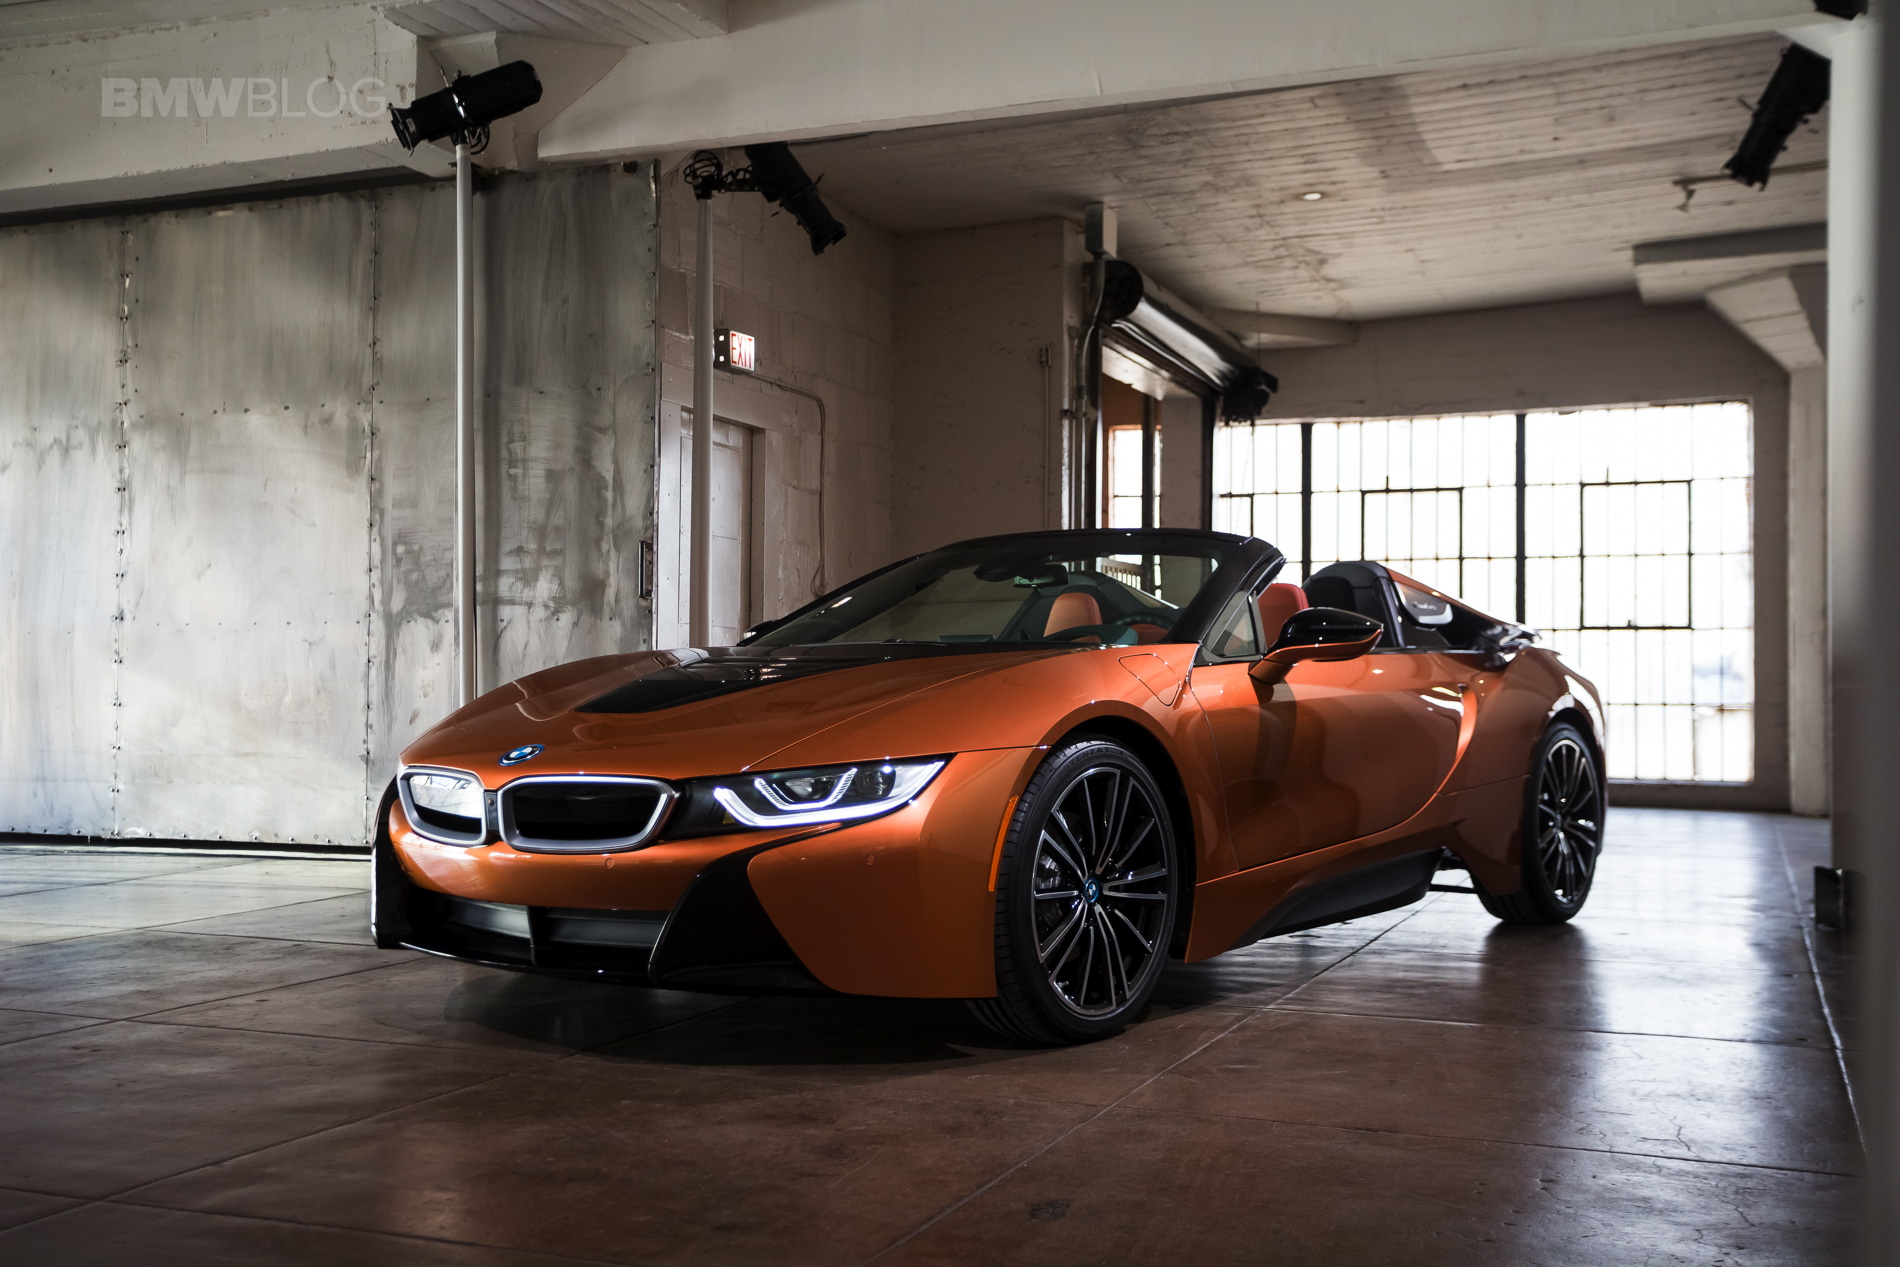 2018-BMW-i8-Roadster-30.jpg